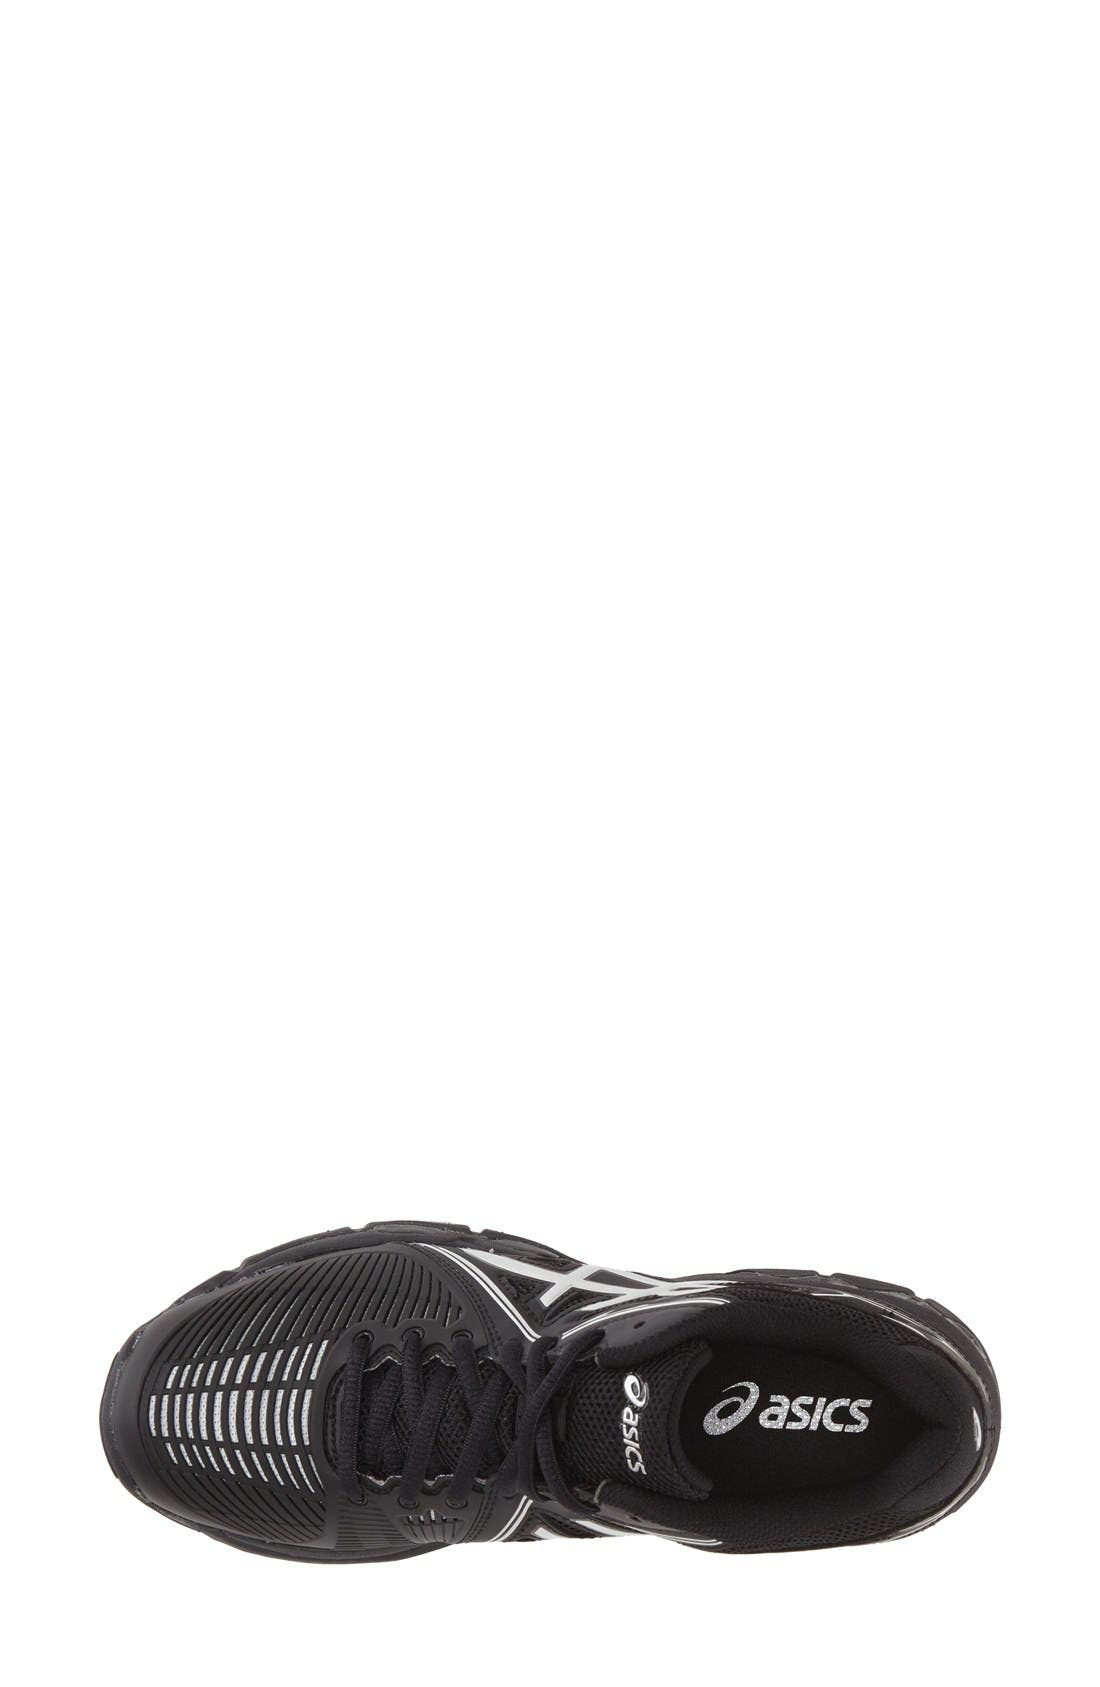 Alternate Image 3  - ASICS® 'GEL-Netburner' Mid Volleyball Shoe (Women)